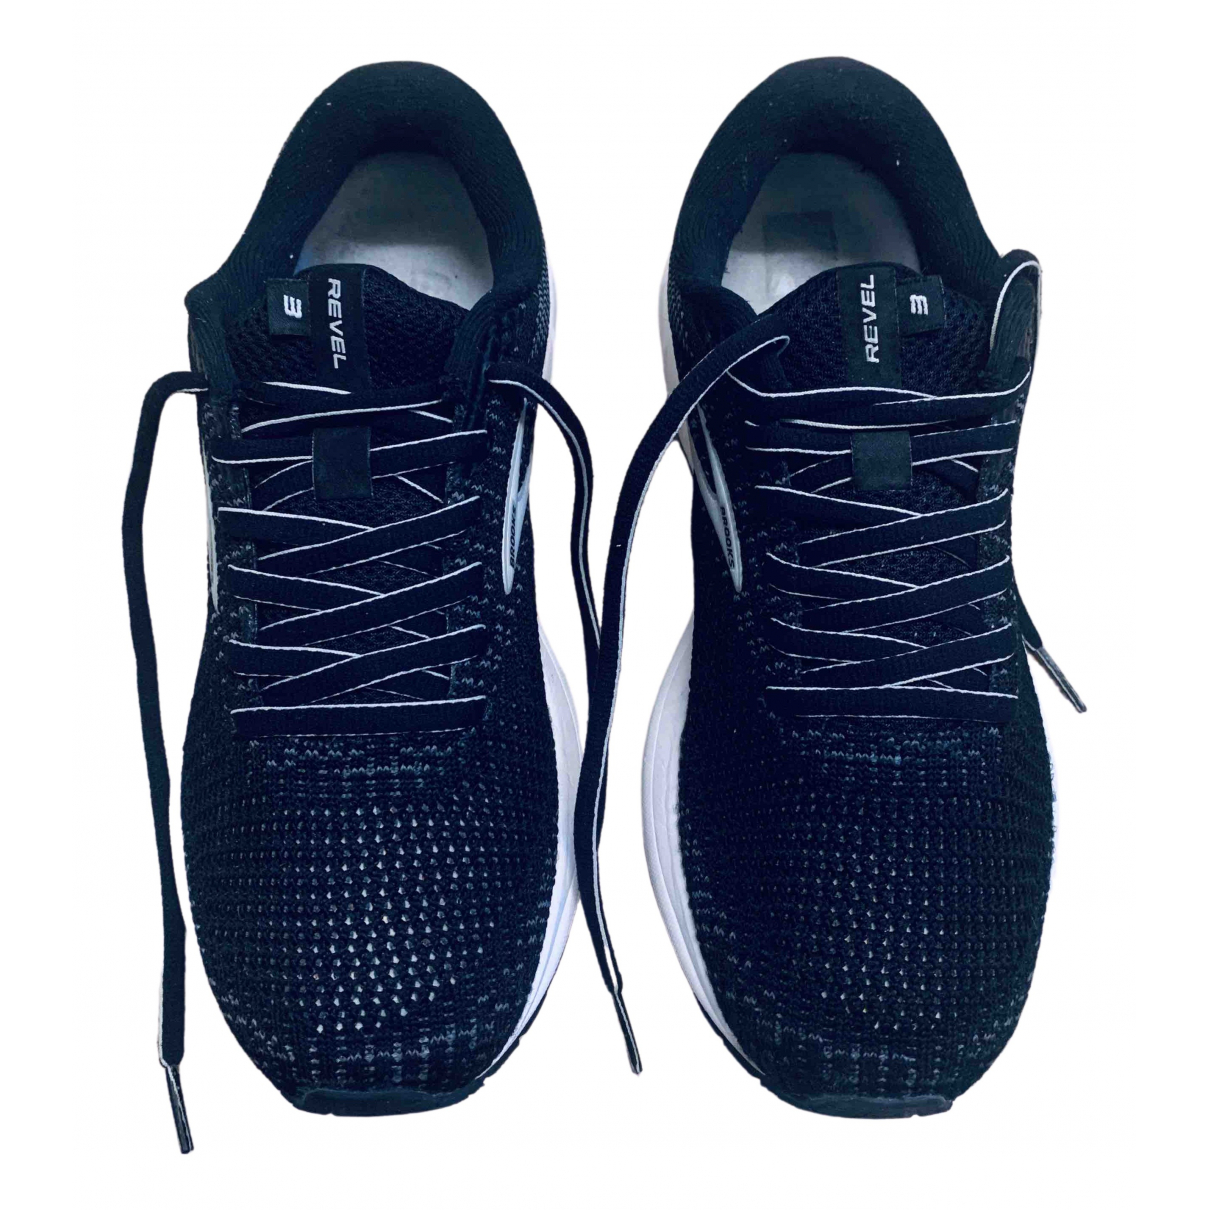 Brooks \N Sneakers in  Schwarz Leinen